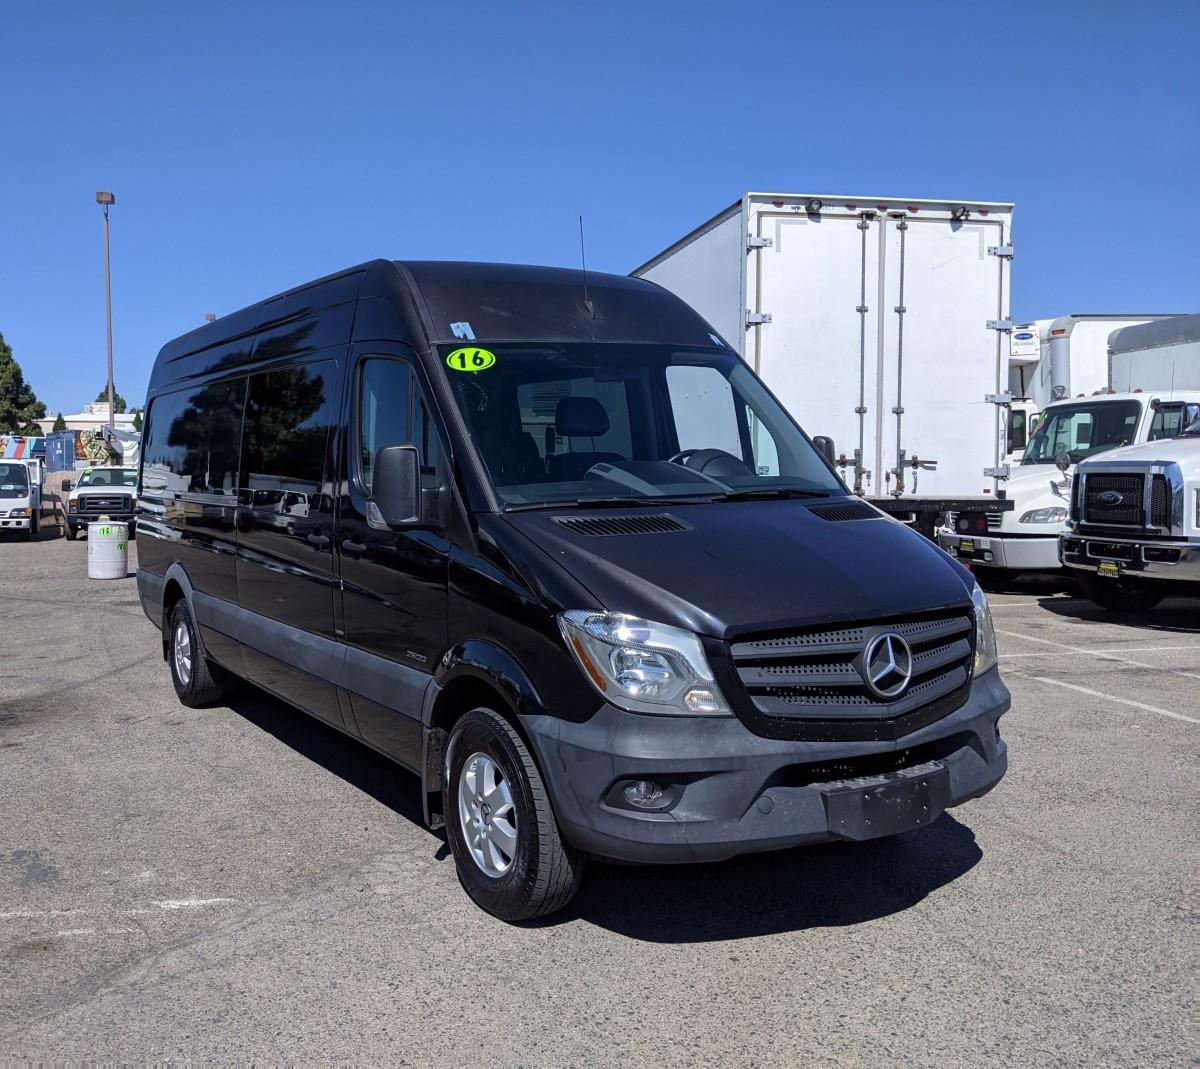 Used 2016 Mercedes-Benz Sprinter 2500 High Roof Crew Cargo Van 170WB DIESEL in Fountain Valley, CA